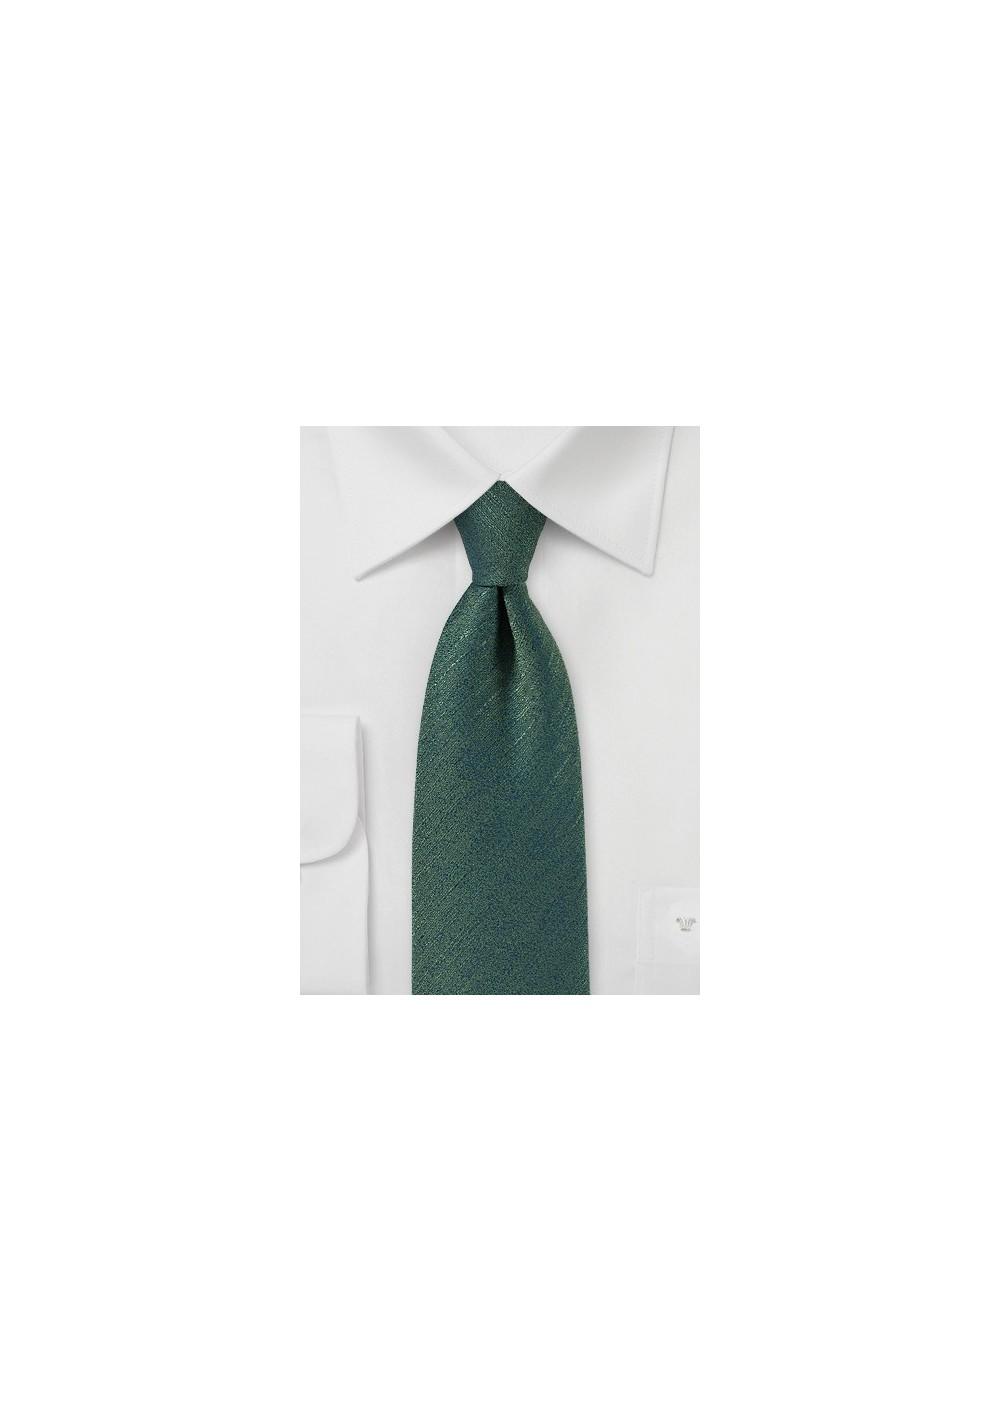 Vintage Textured Tie in Pine Green